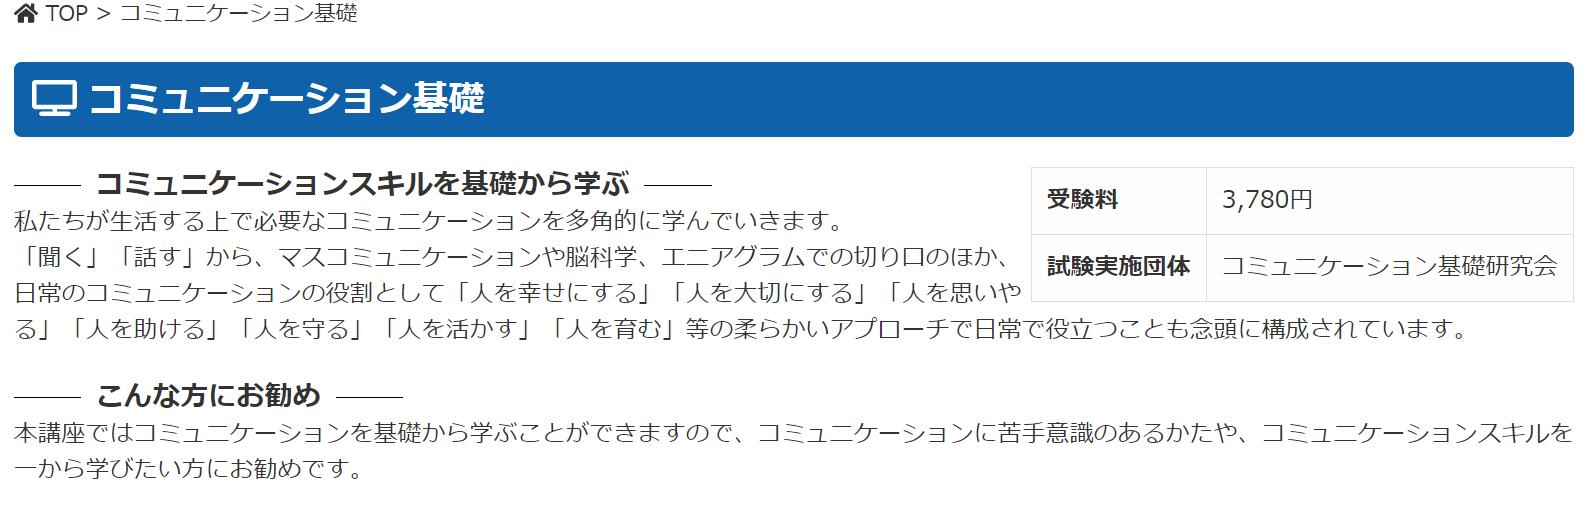 就労移行支援事業所 ティオ 札幌